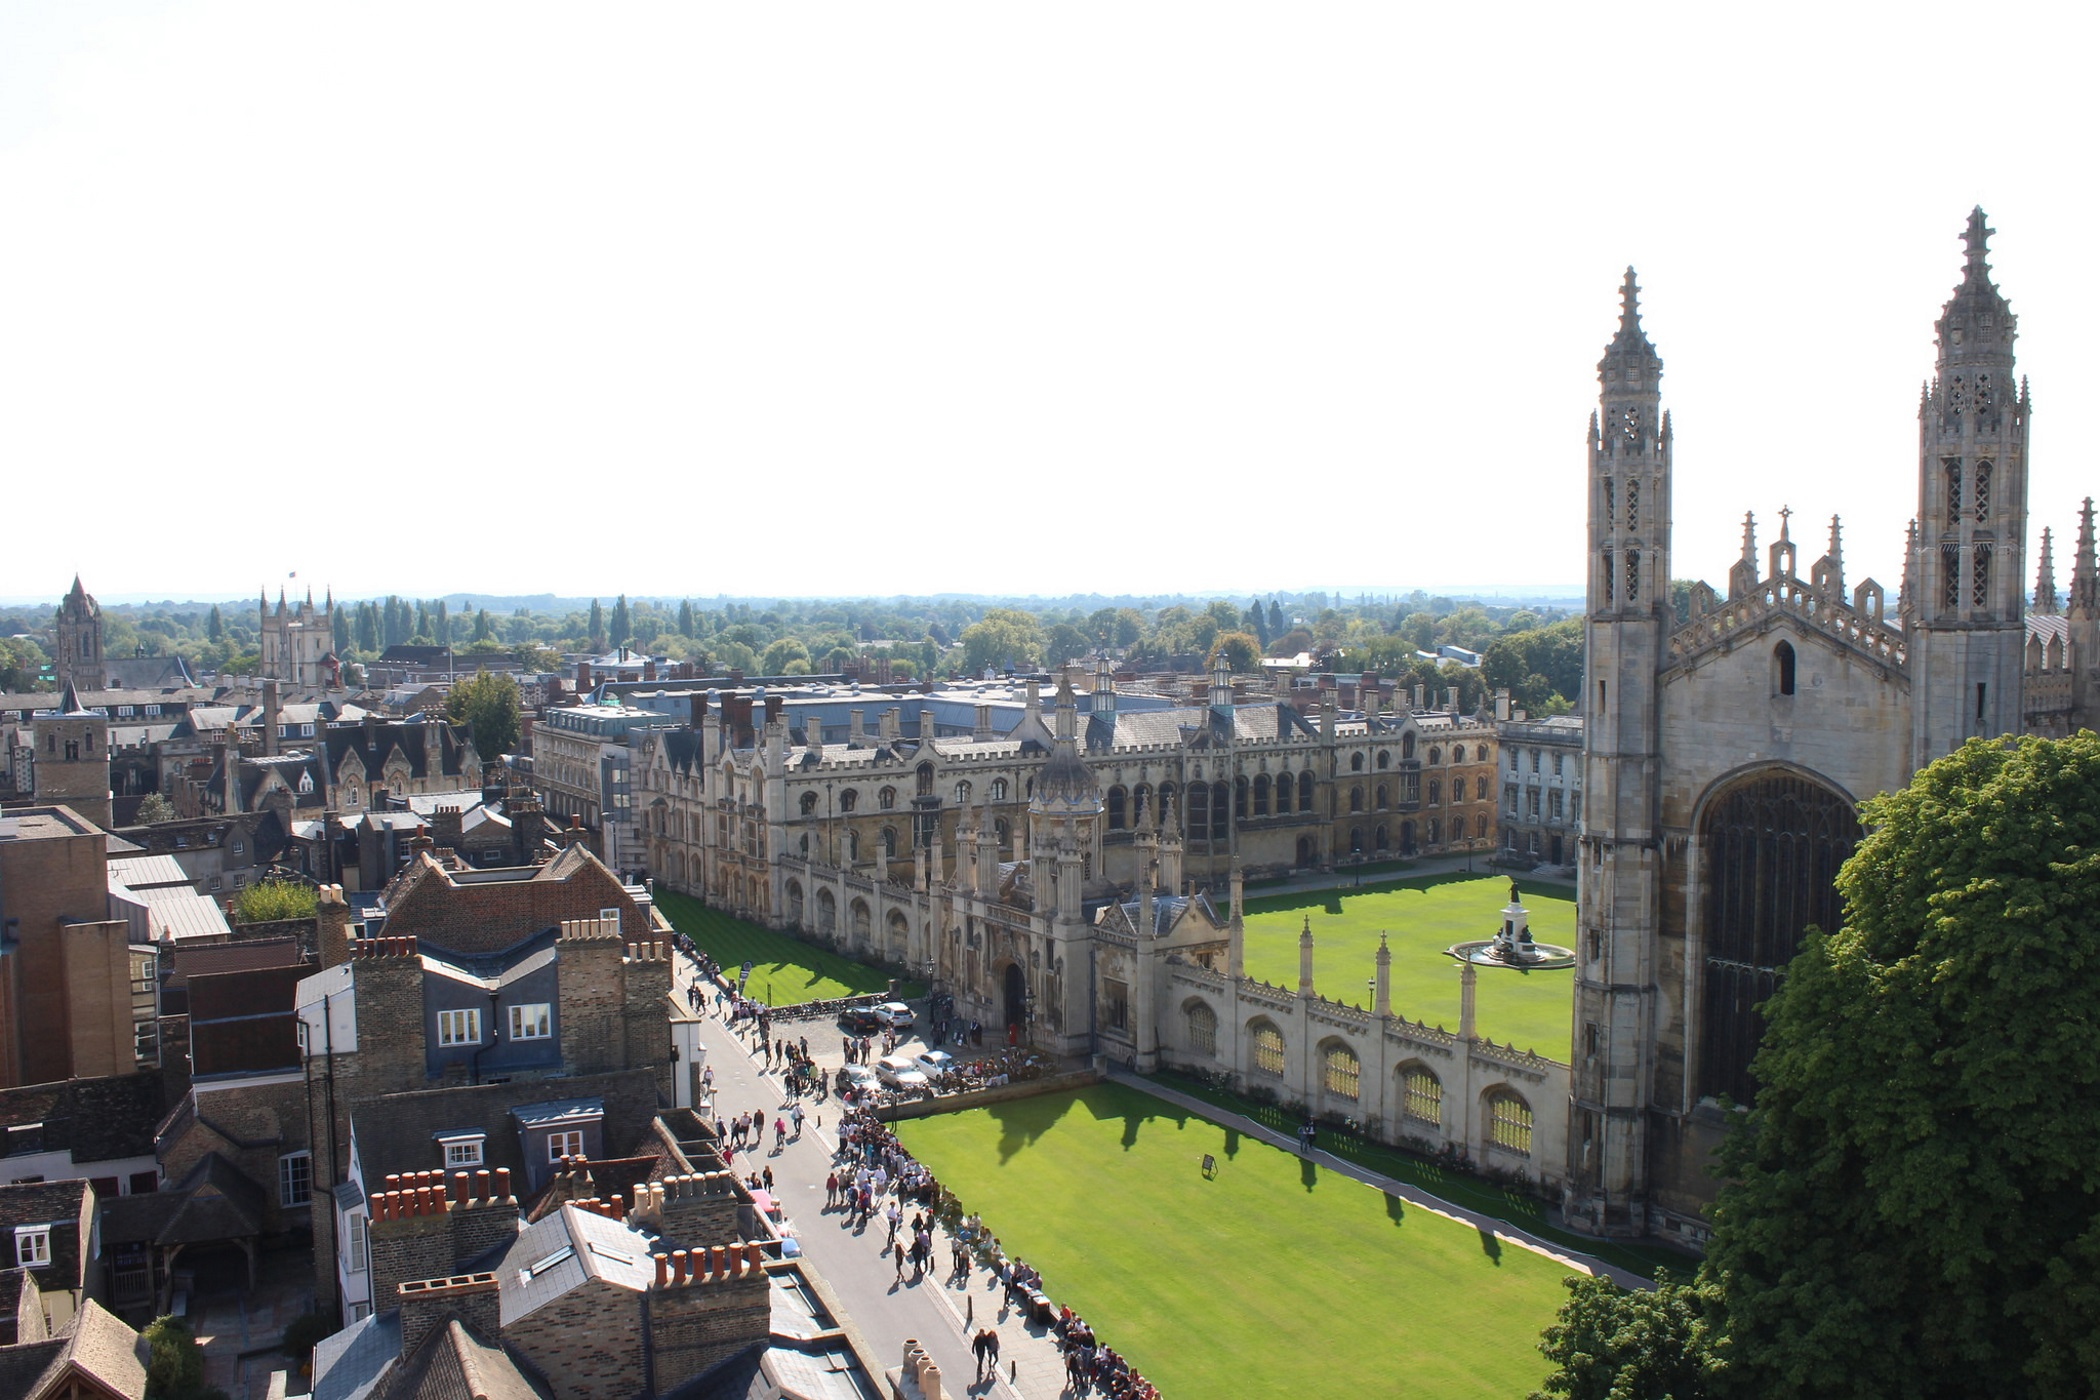 00-uk-england-university-of-cambridge-080117